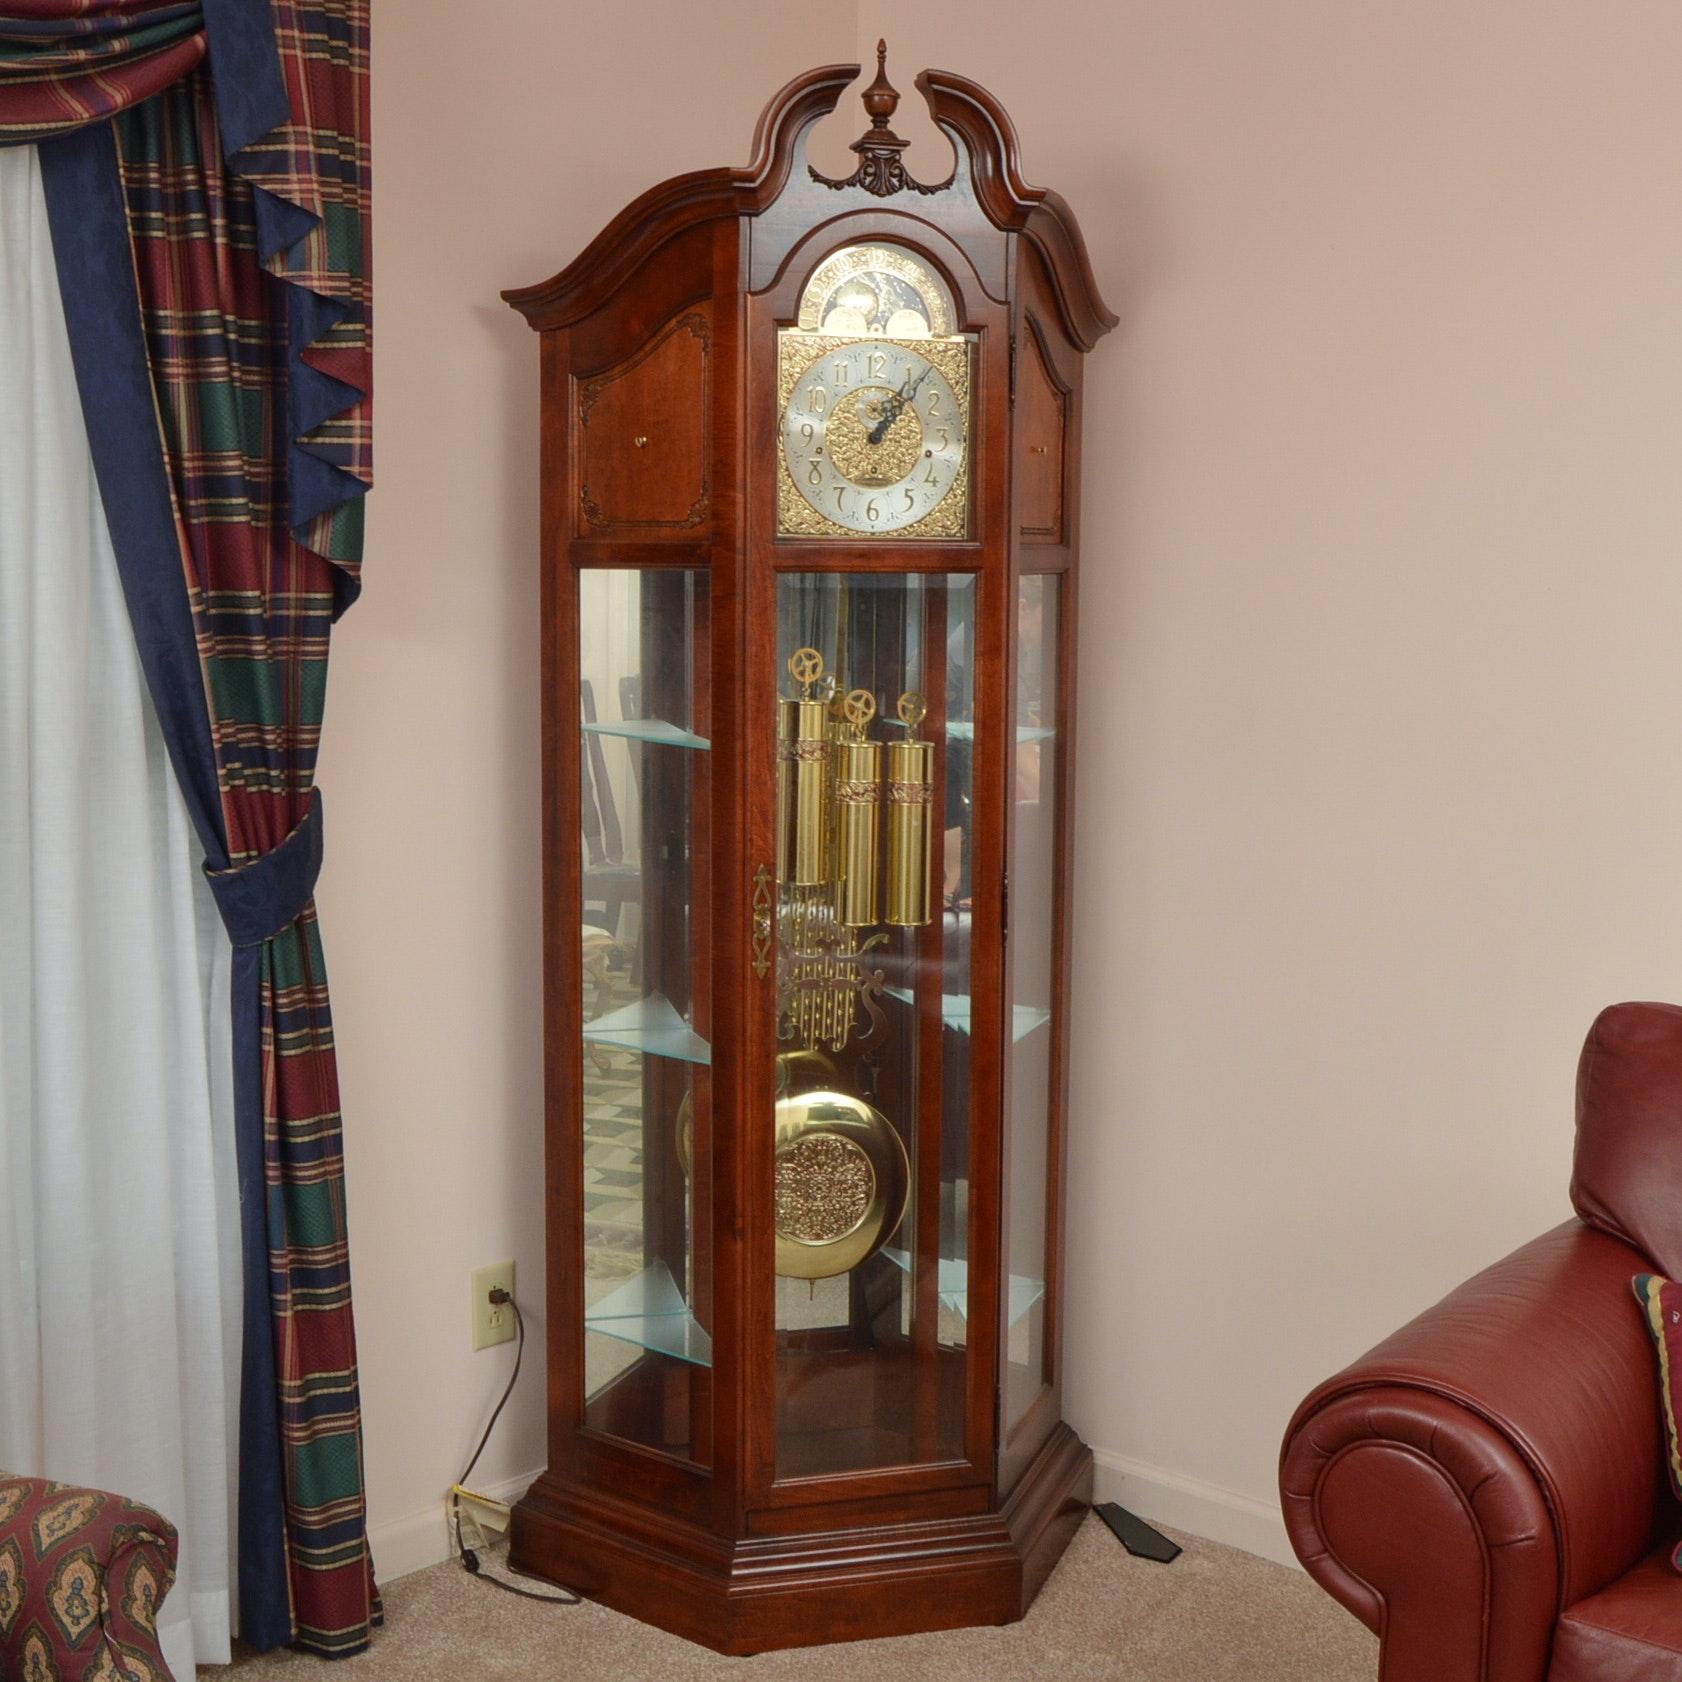 howard miller u201cthe grandfather clock - Howard Miller Grandfather Clock